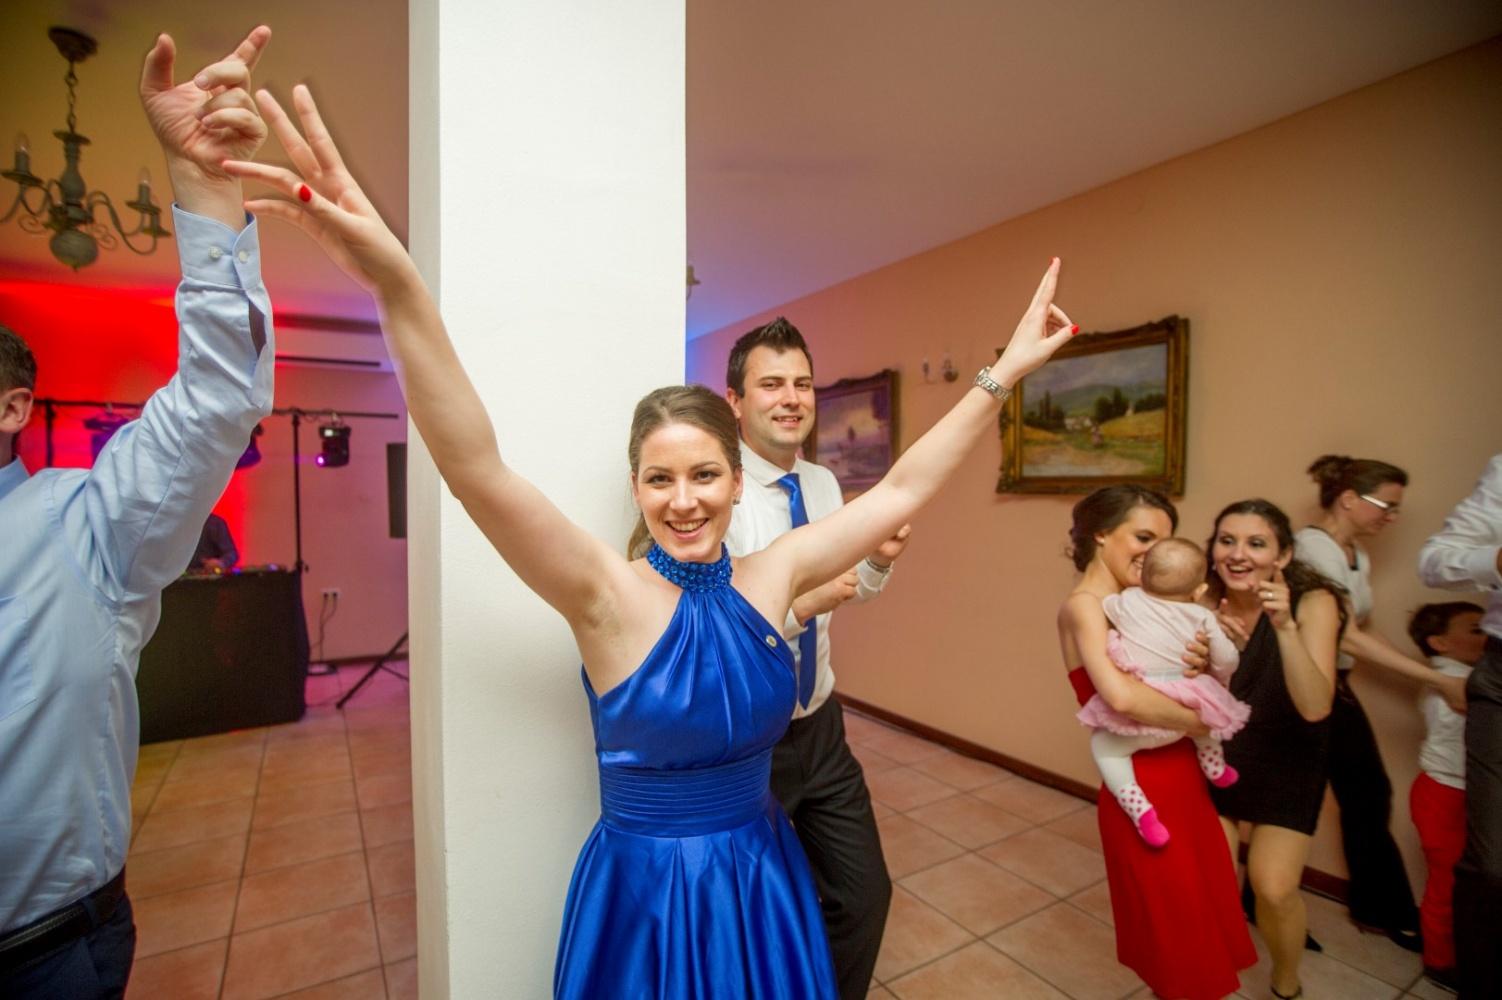 http://www.fotoz.sk/images/gallery-23/normal/svadba-_sv_petrus-vini_139.jpg